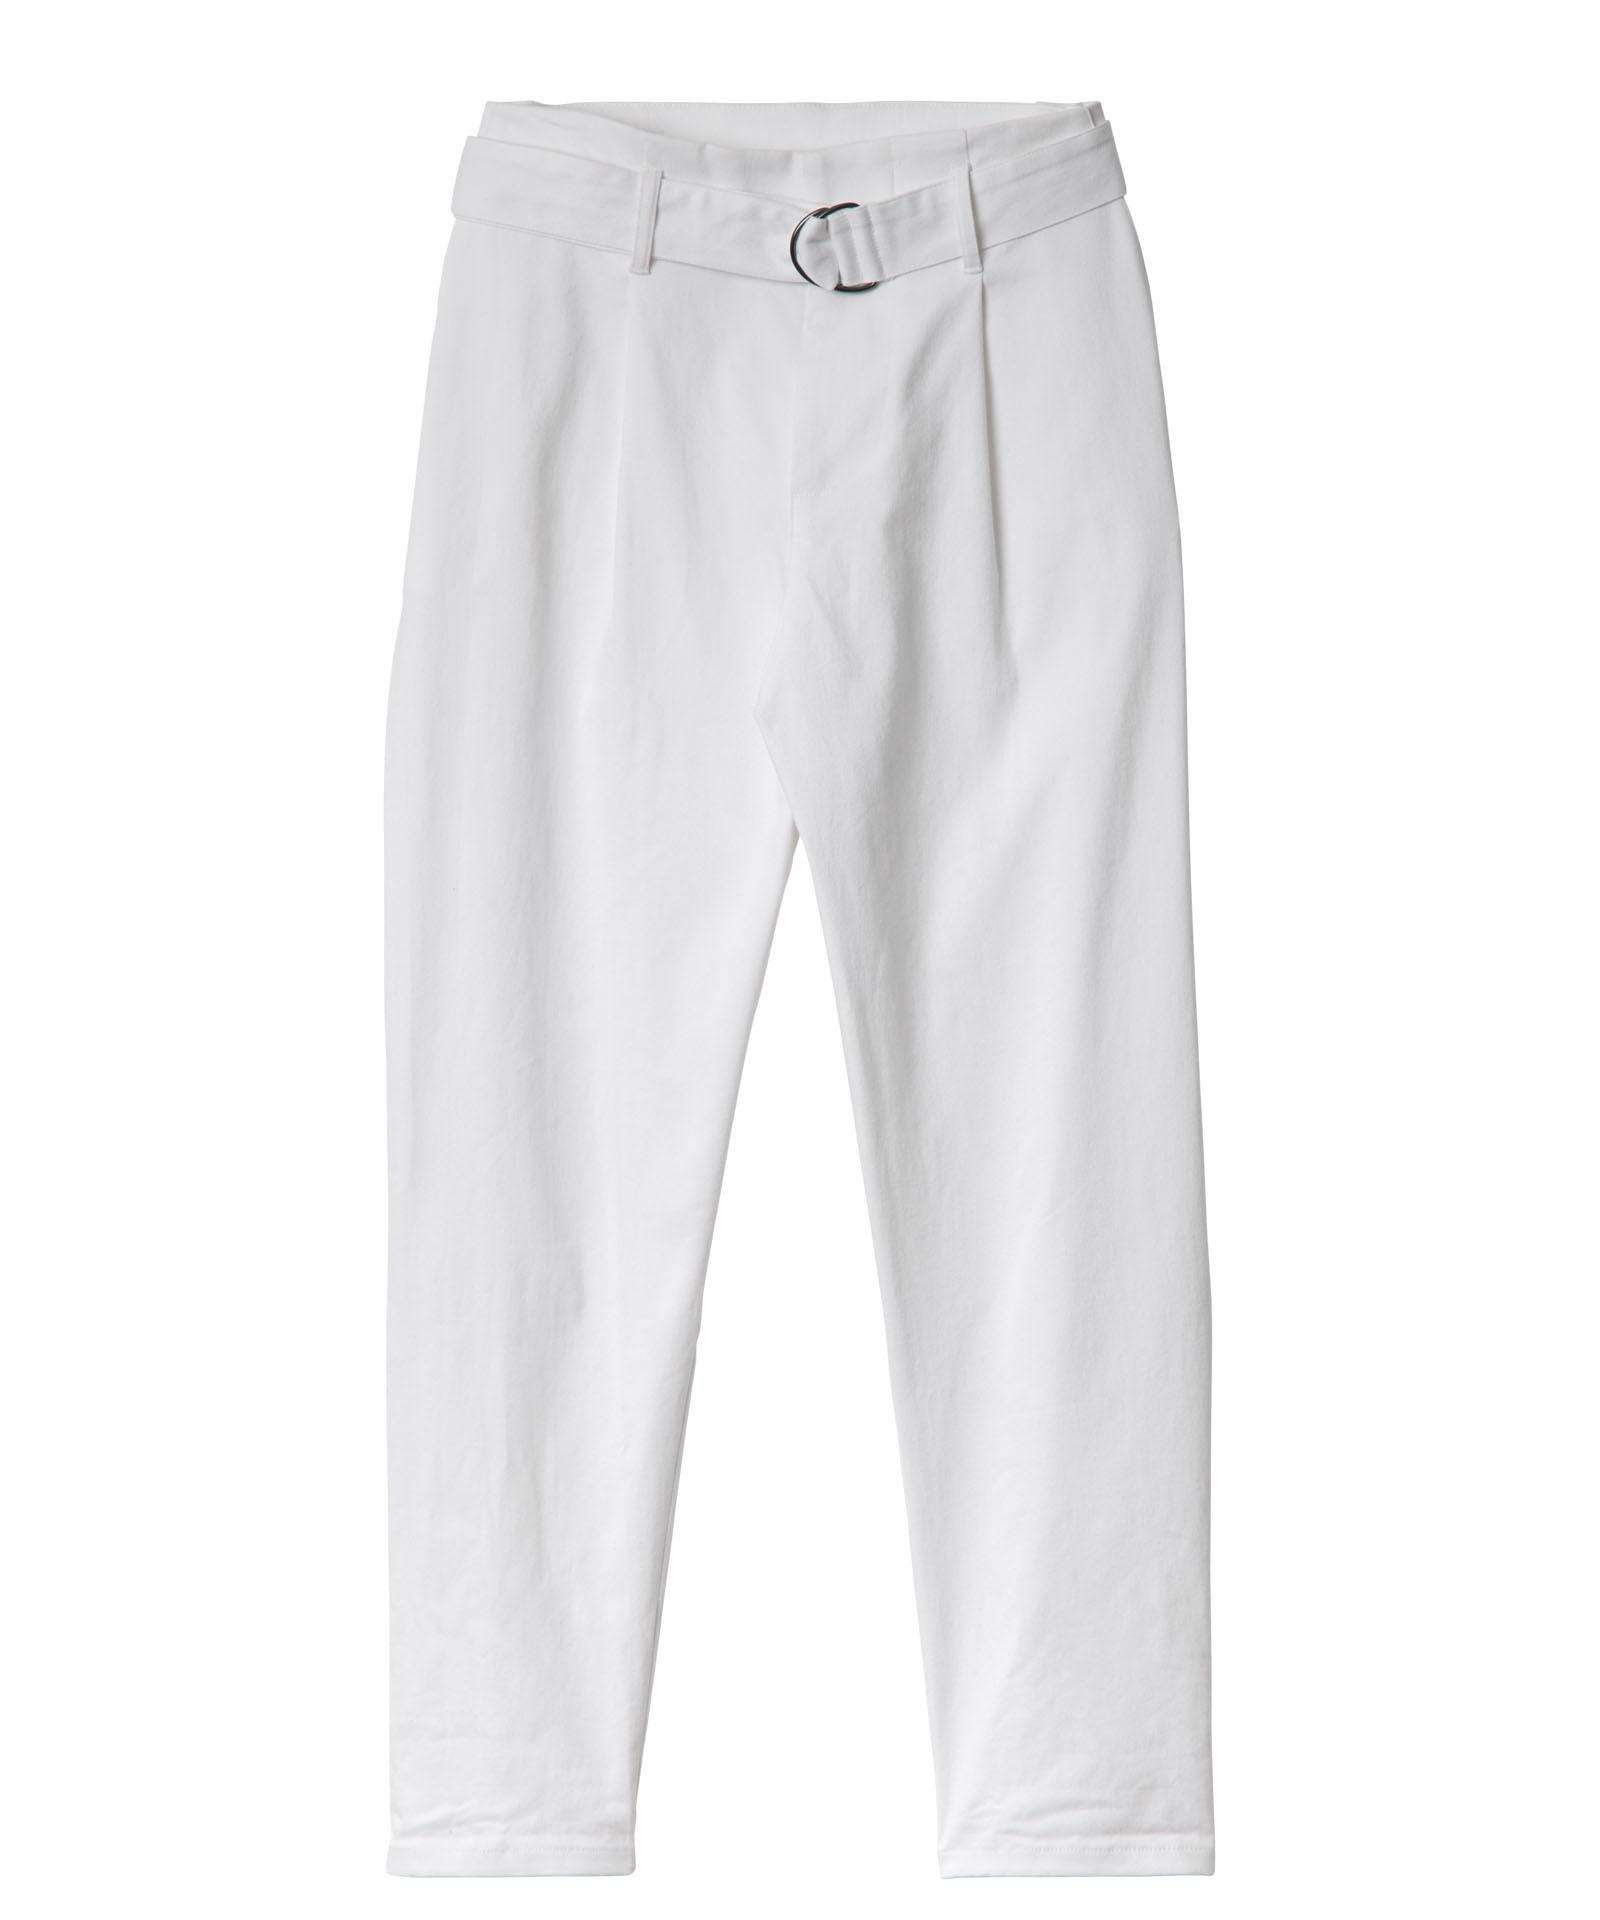 10days white pants